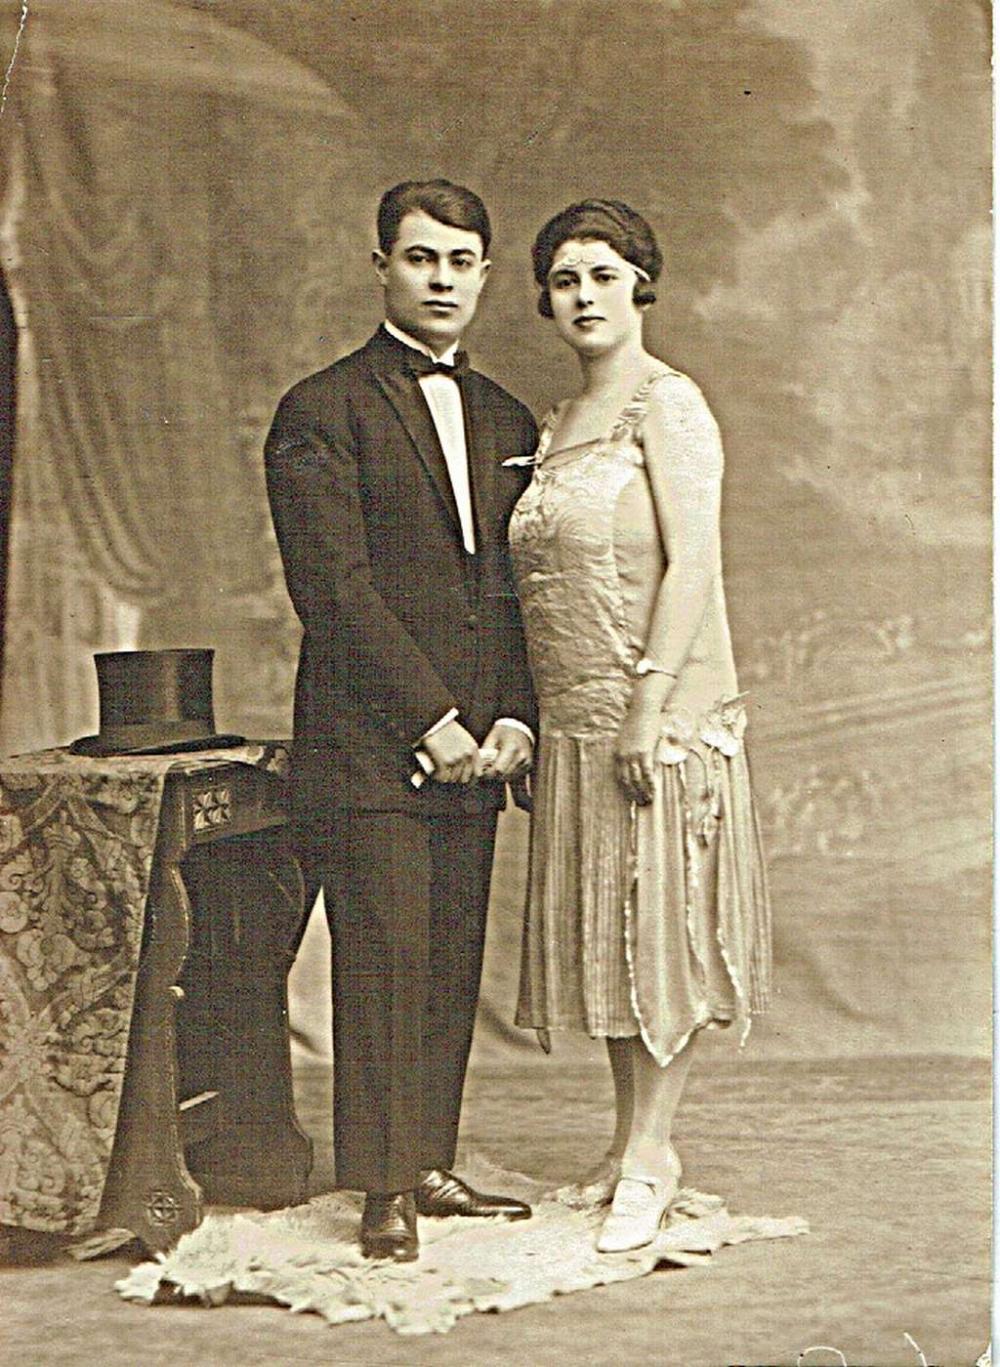 Antique Wedding Photo of a Jewish Couple.